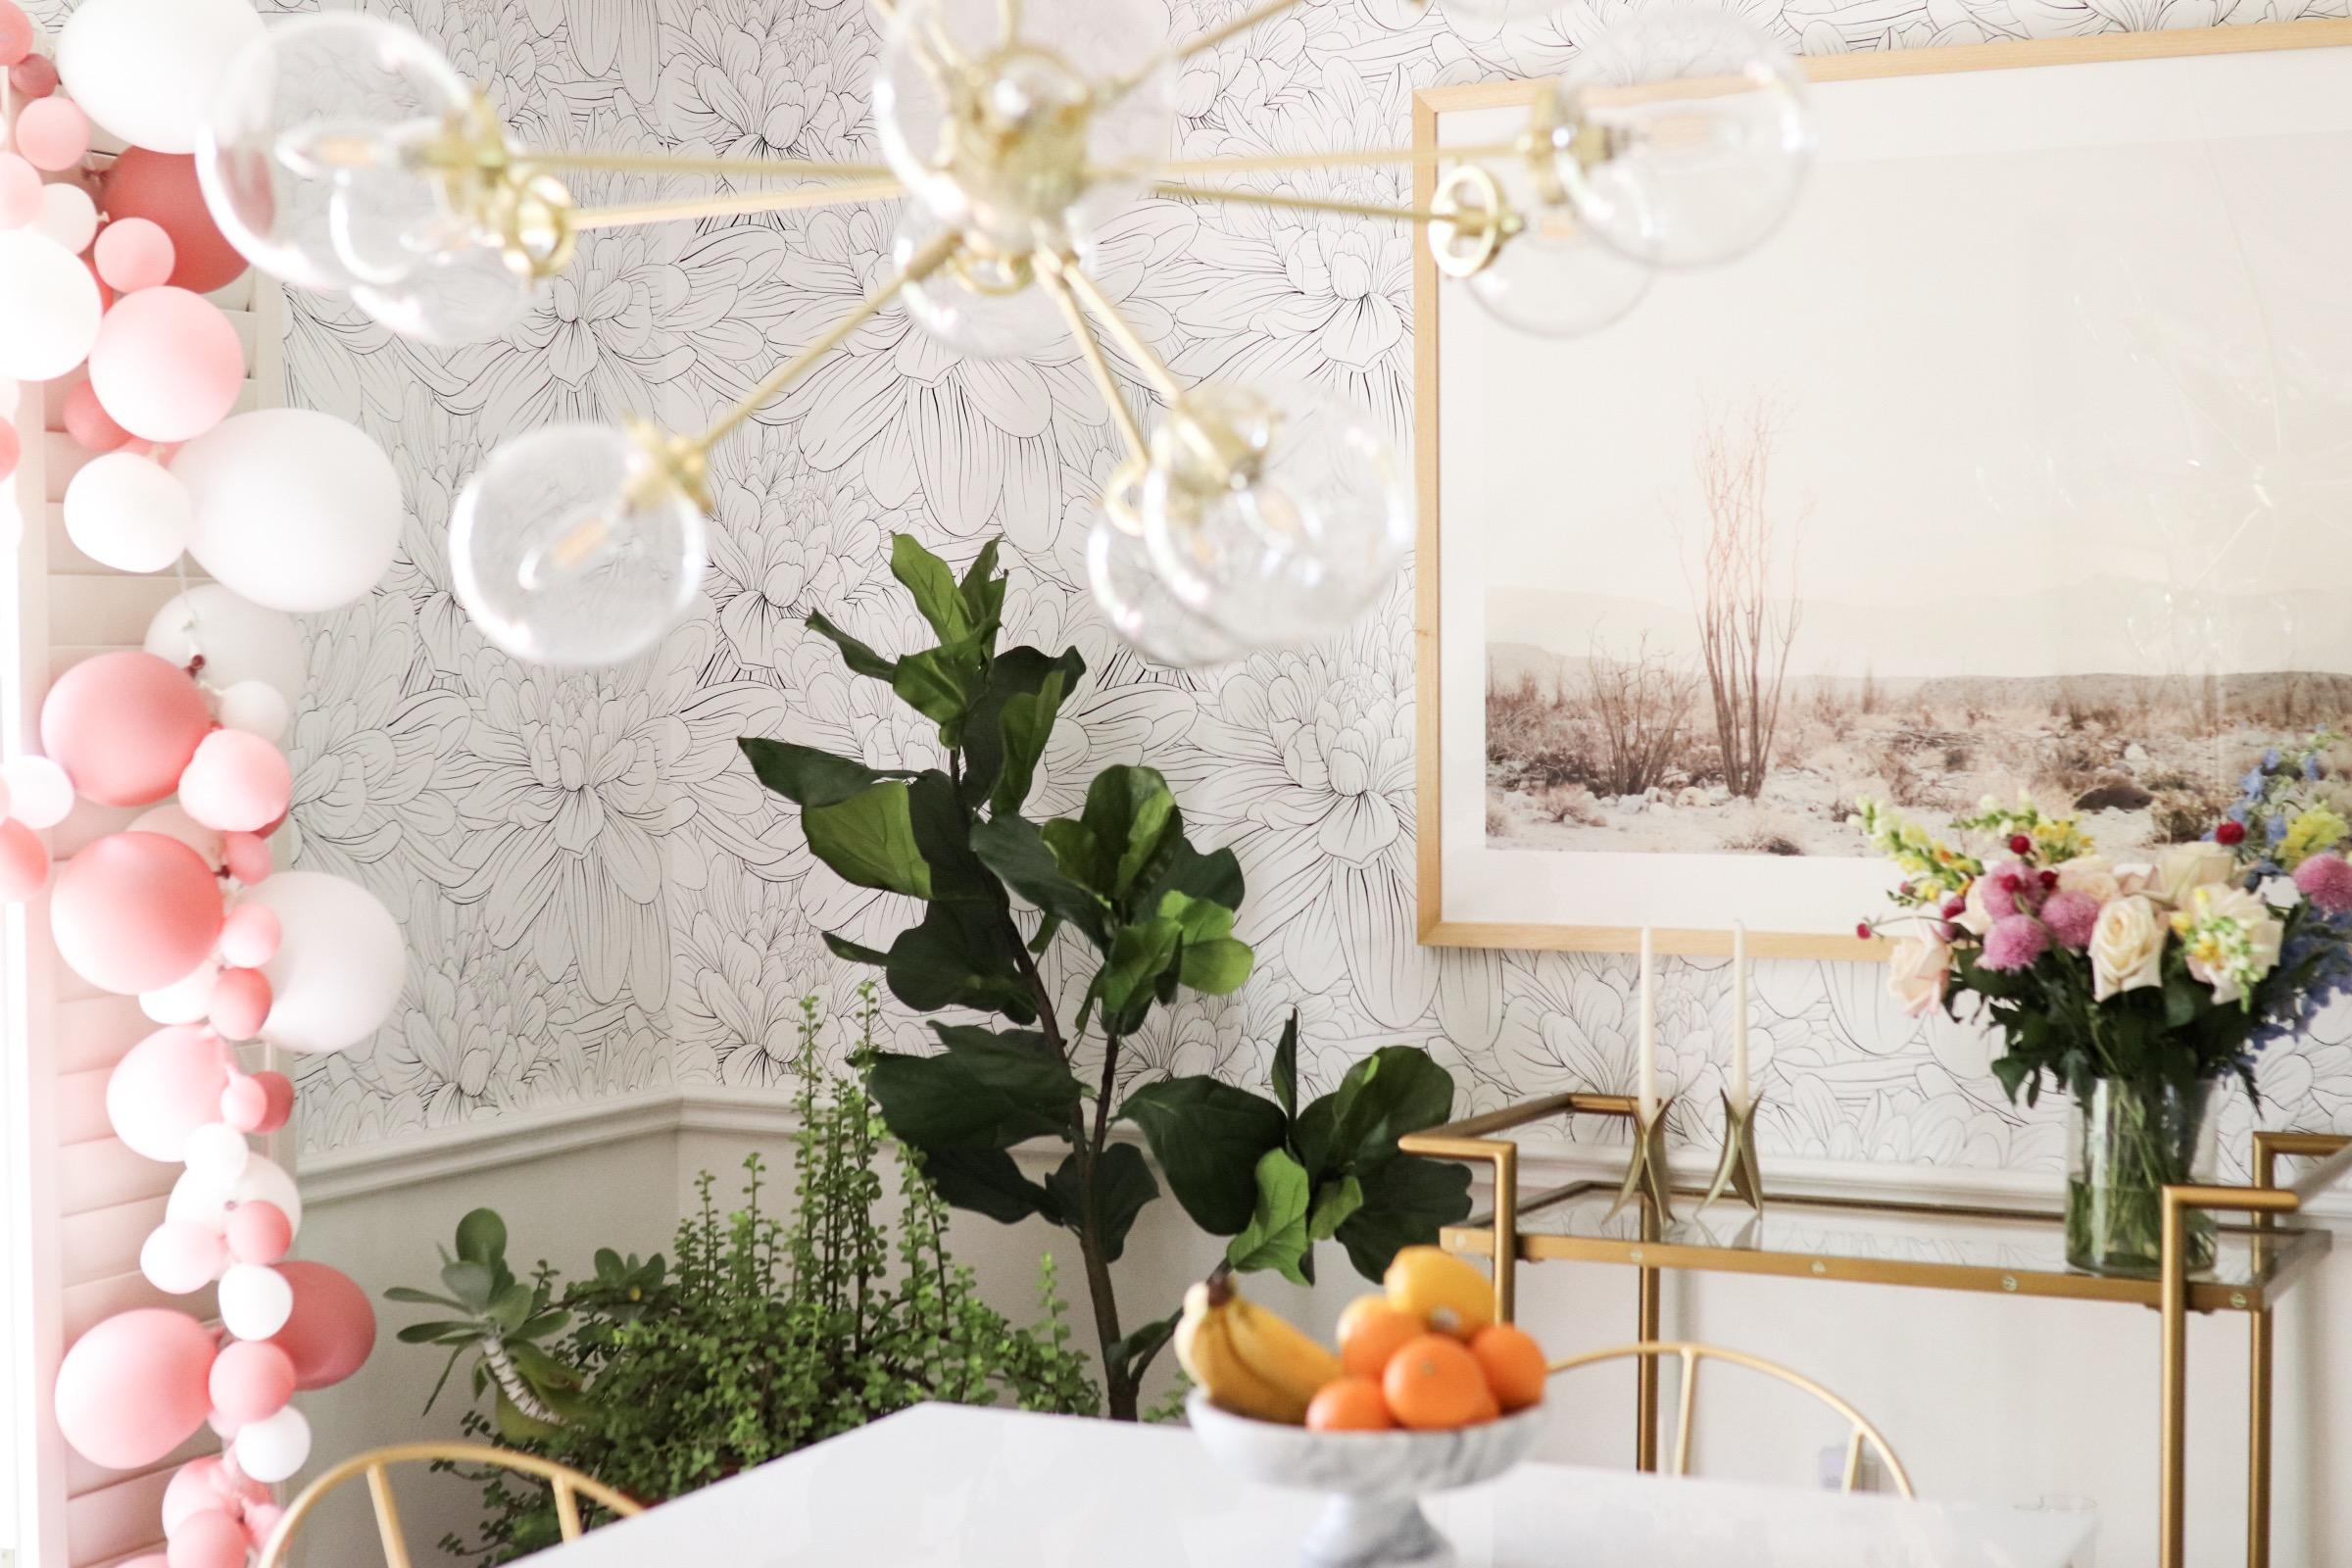 Home decor blogger Joyfullygreen wallpaper dining room makeover how to choose art with minted -12.jpg